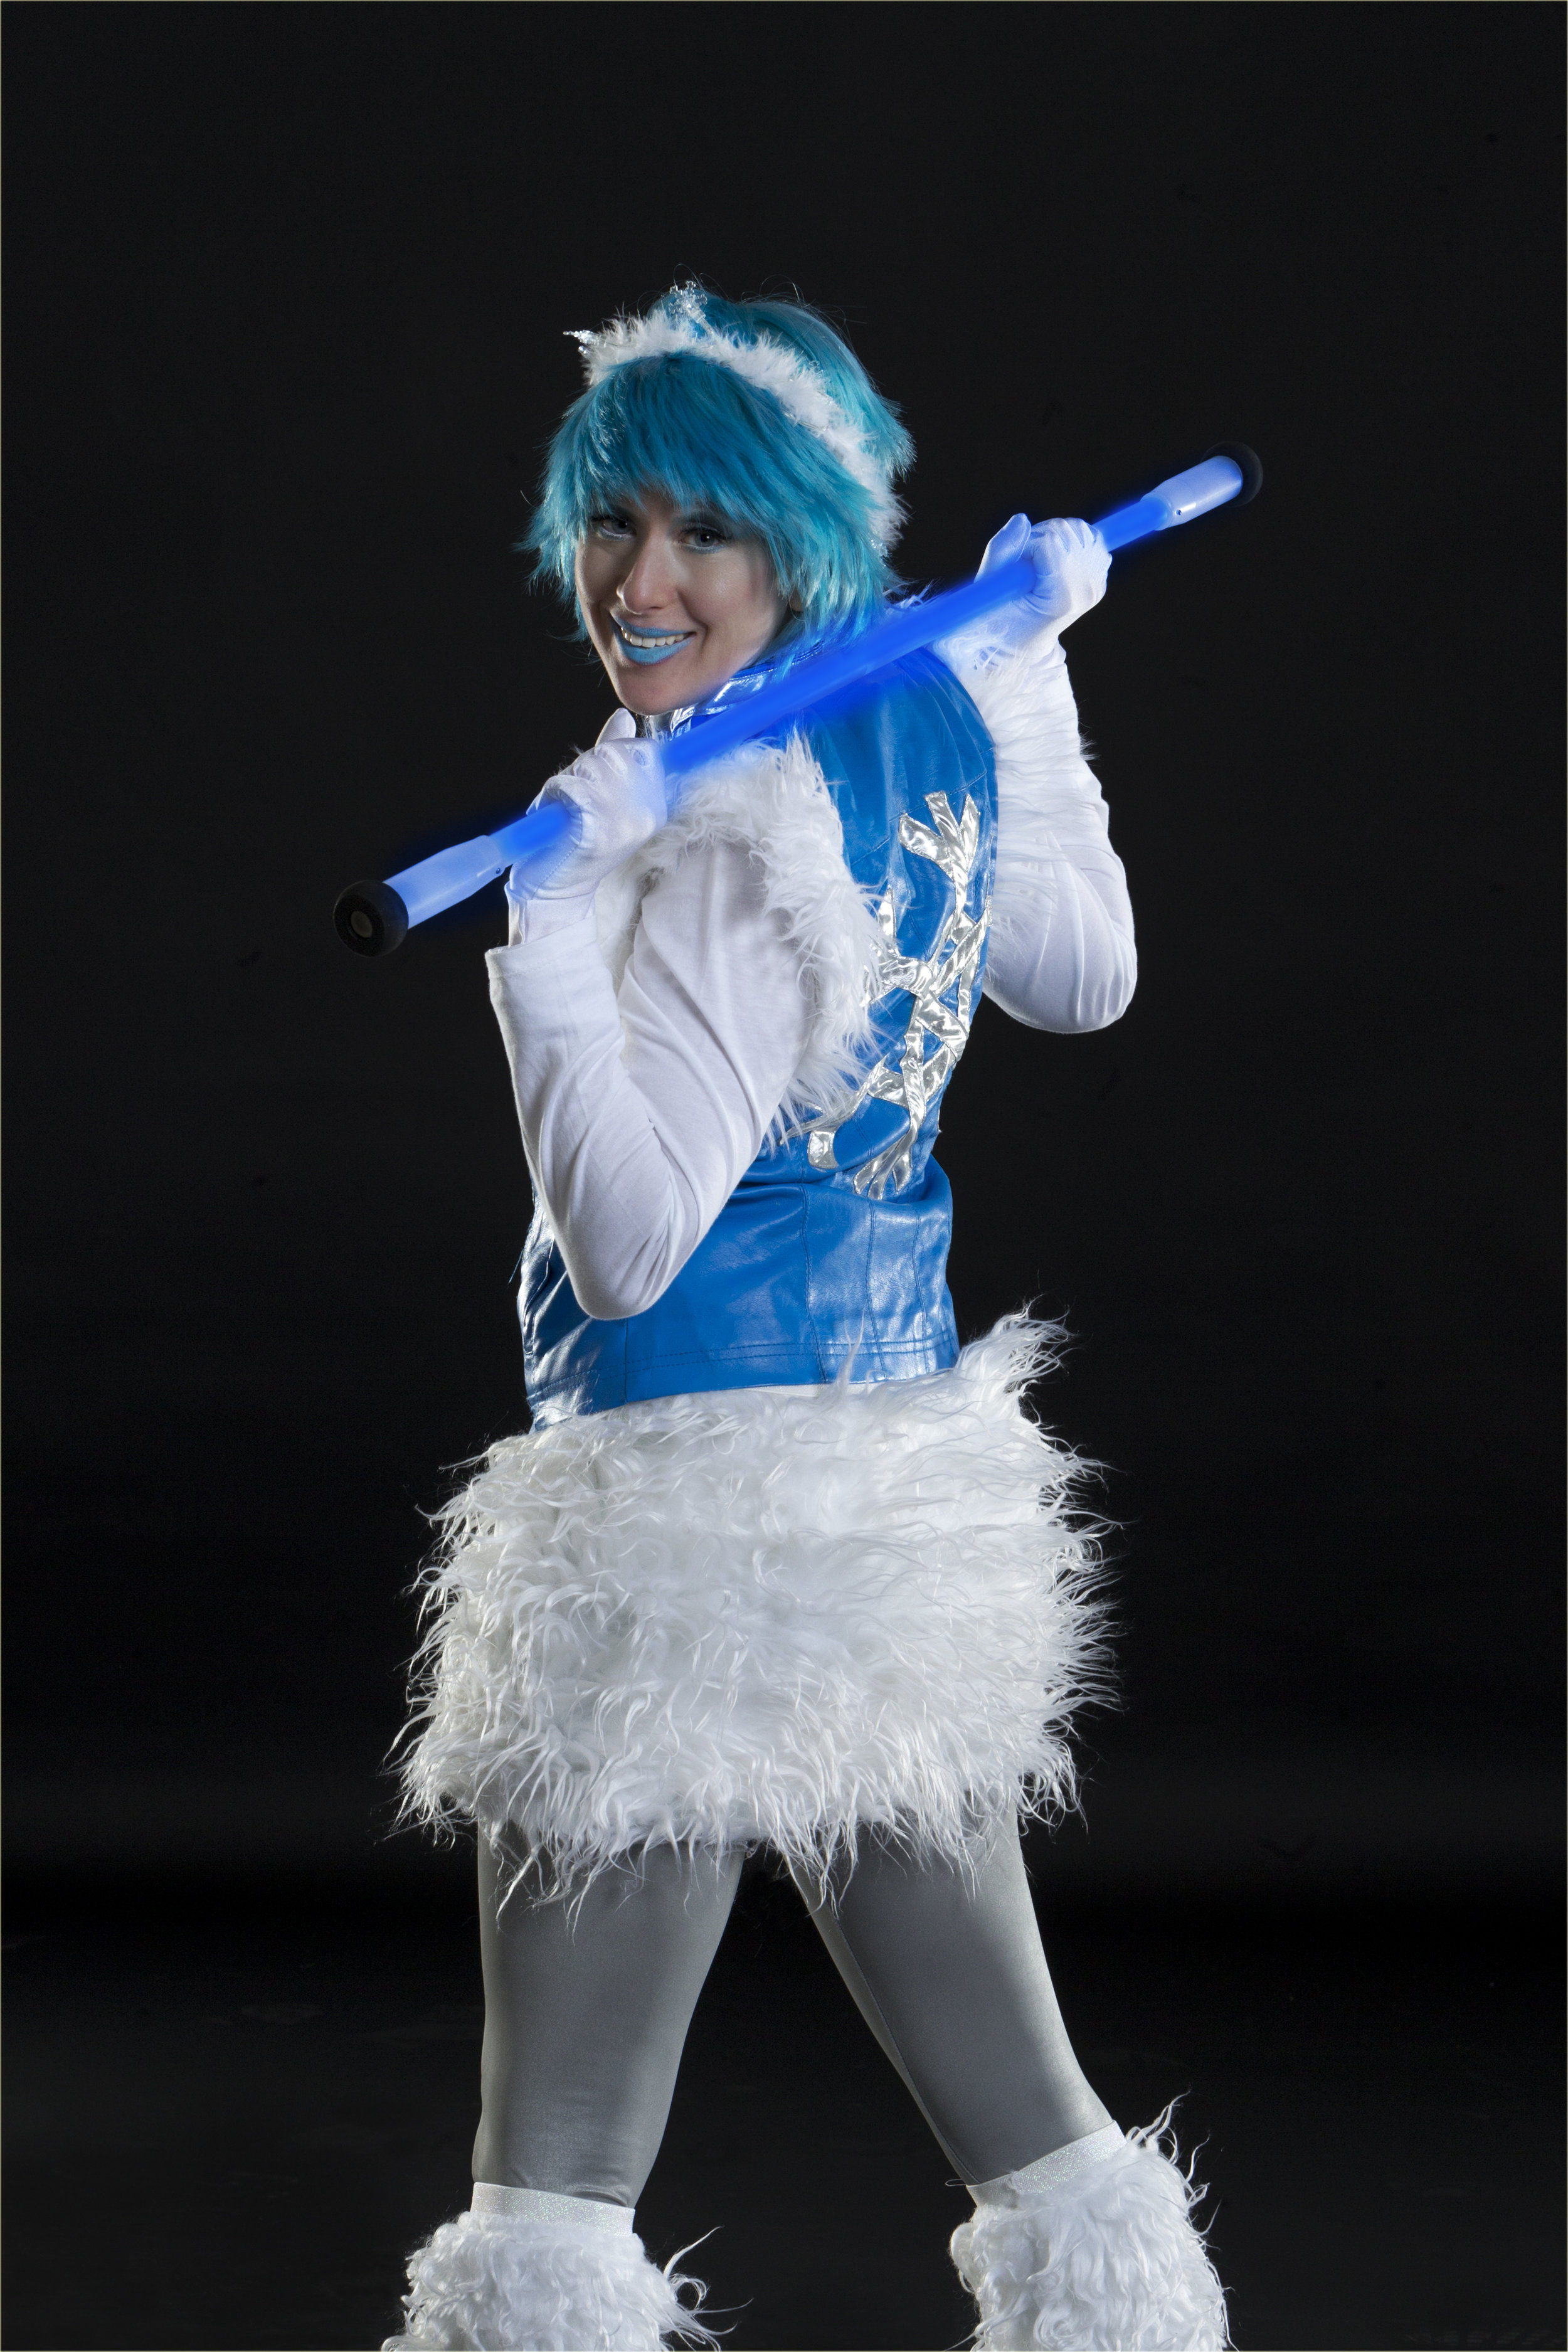 Bex Ice Girl 1.jpg